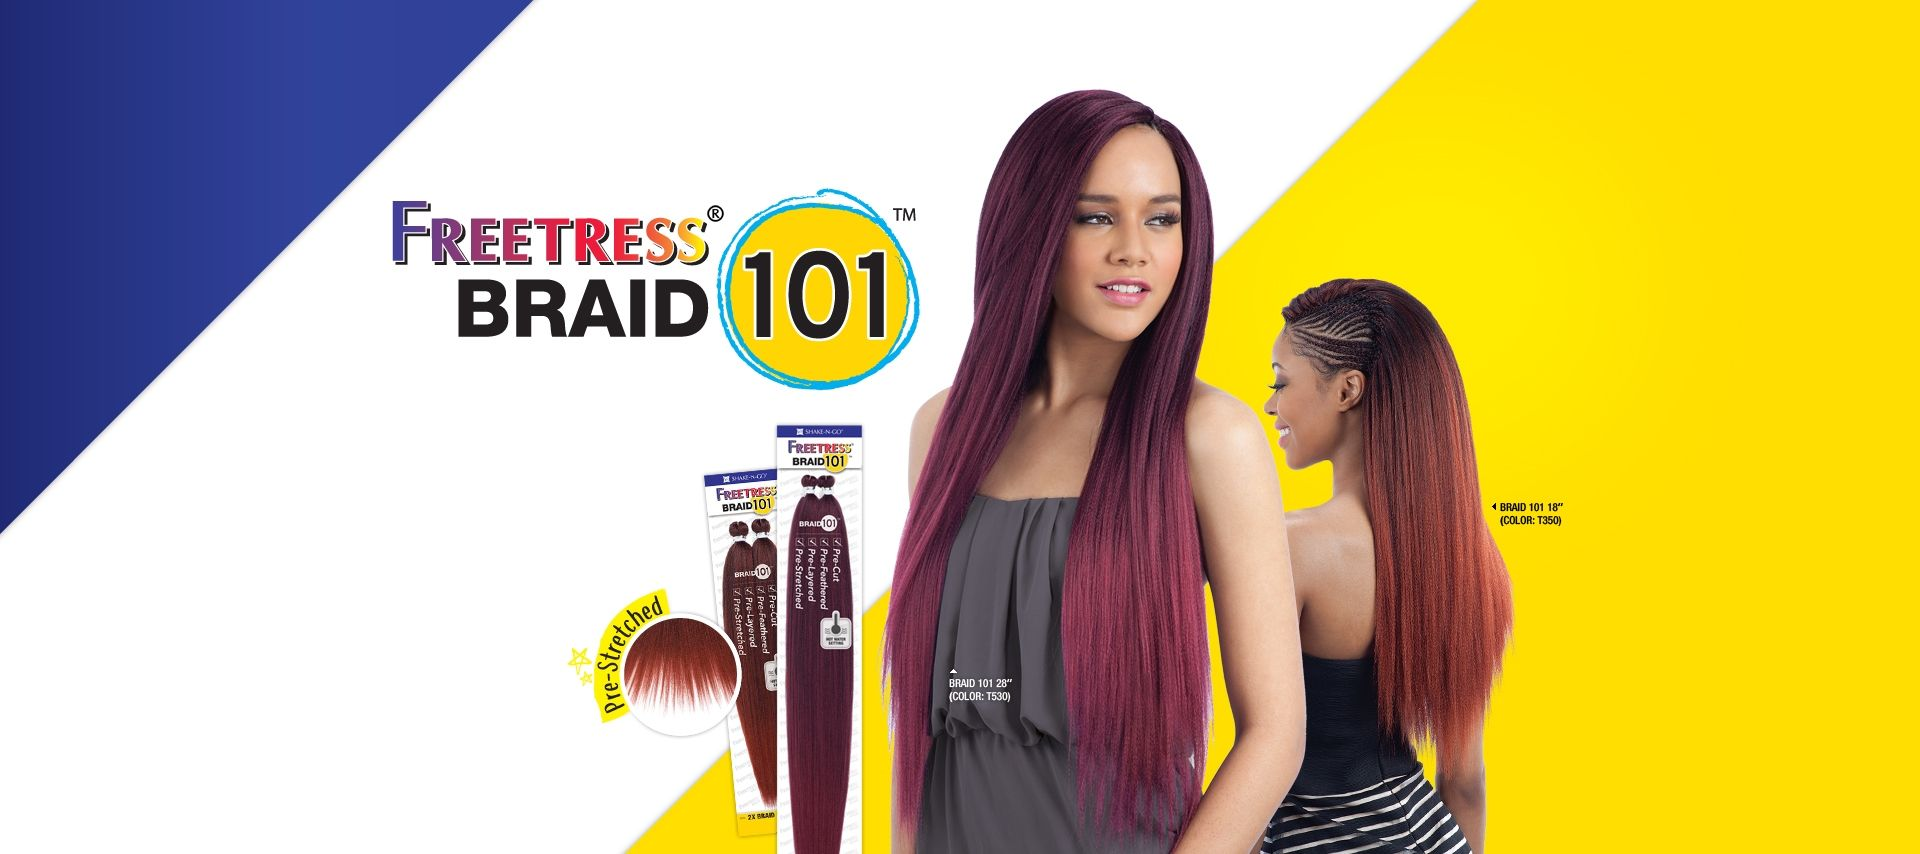 WATER WAVE BULK 12 - Shake-N-Go Fashion, Inc. | Box braid